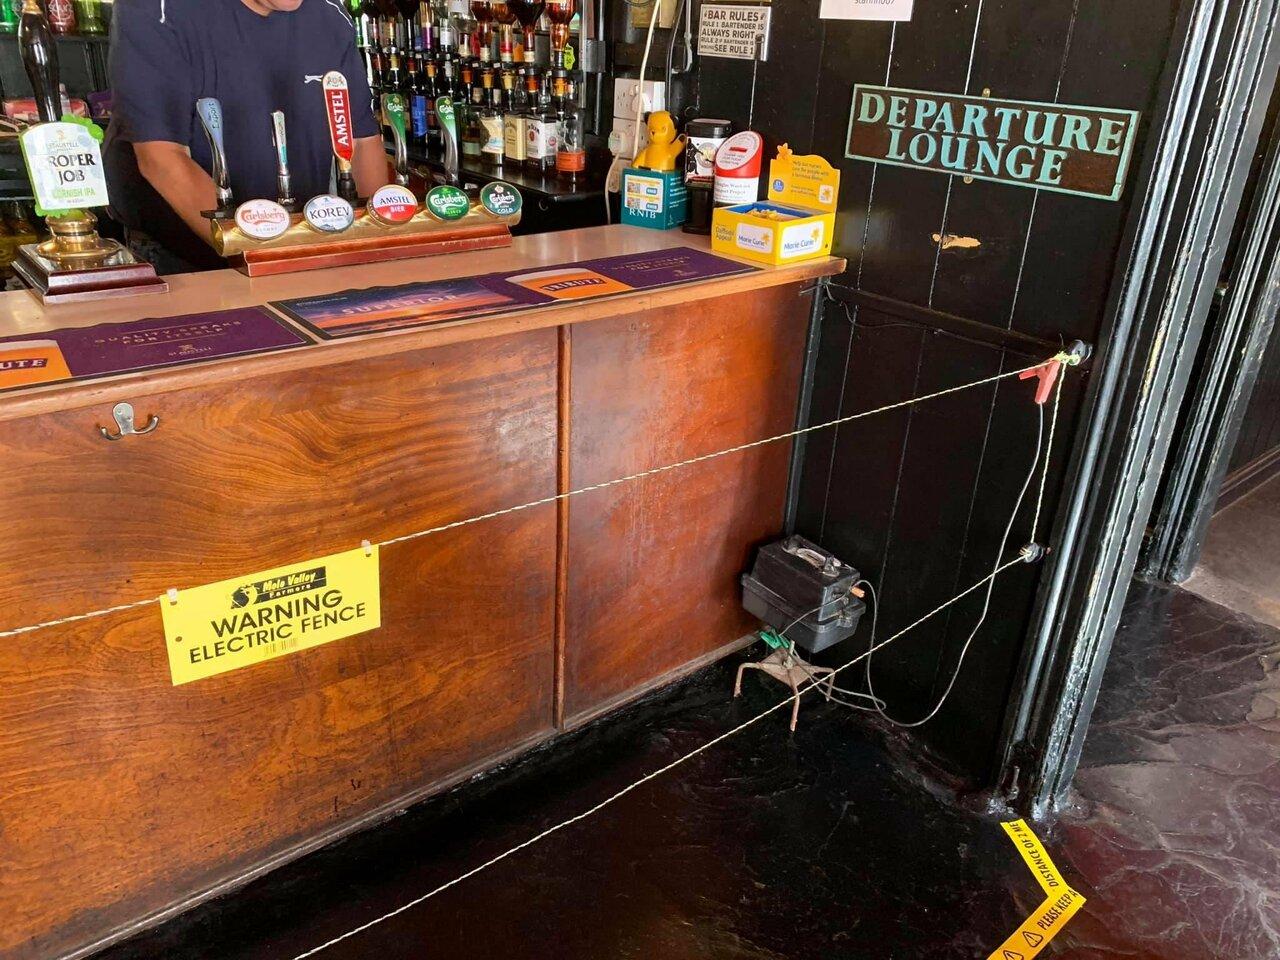 Bar inglés recibe a clientes con valla eléctrica para obligar distanciamiento